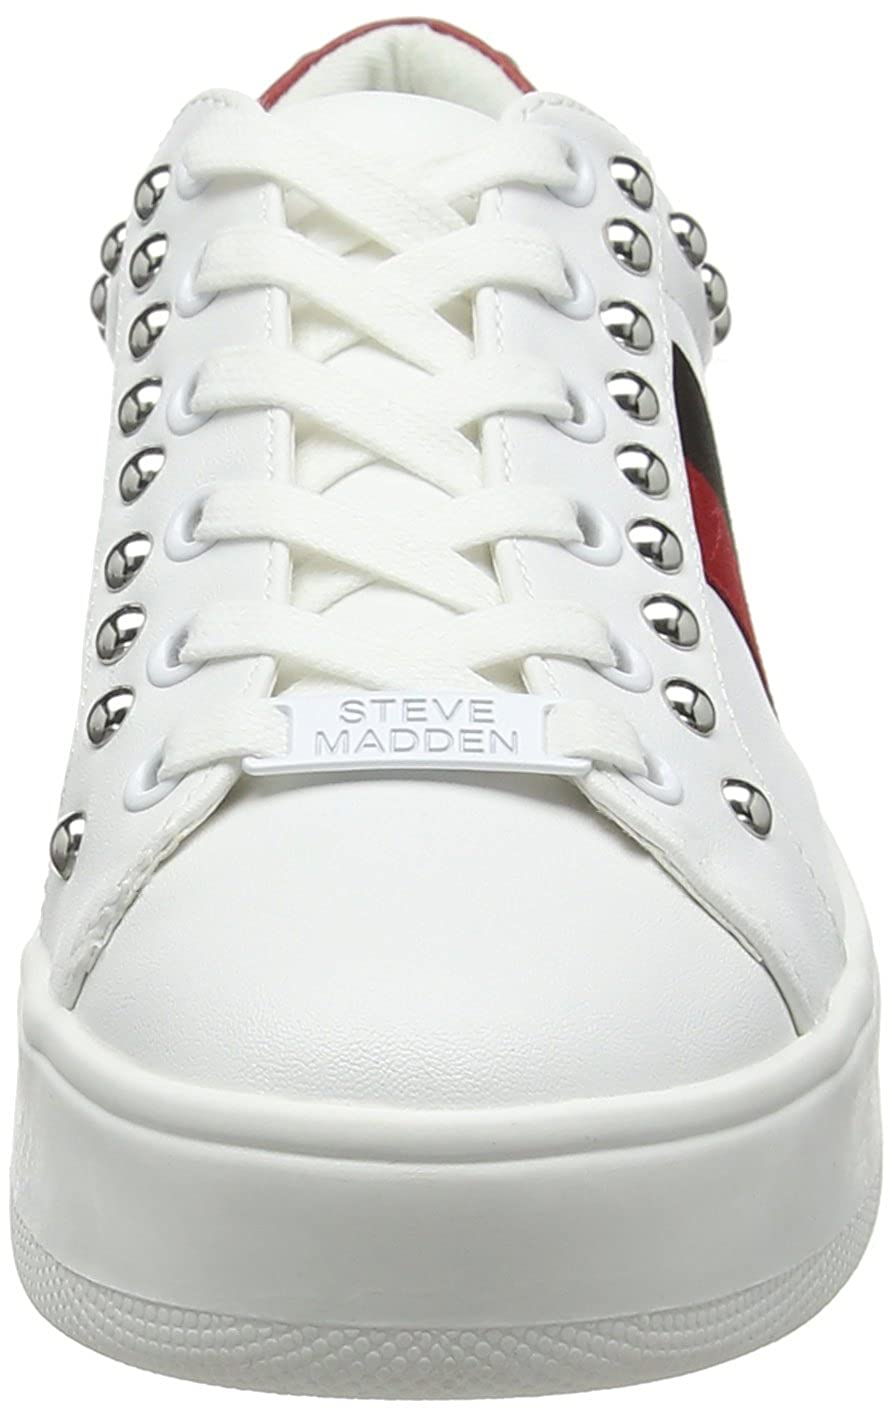 White Steve Madden Footwear Womens Belle Sneaker Trainers White Multi 077 5 UK 38 EU